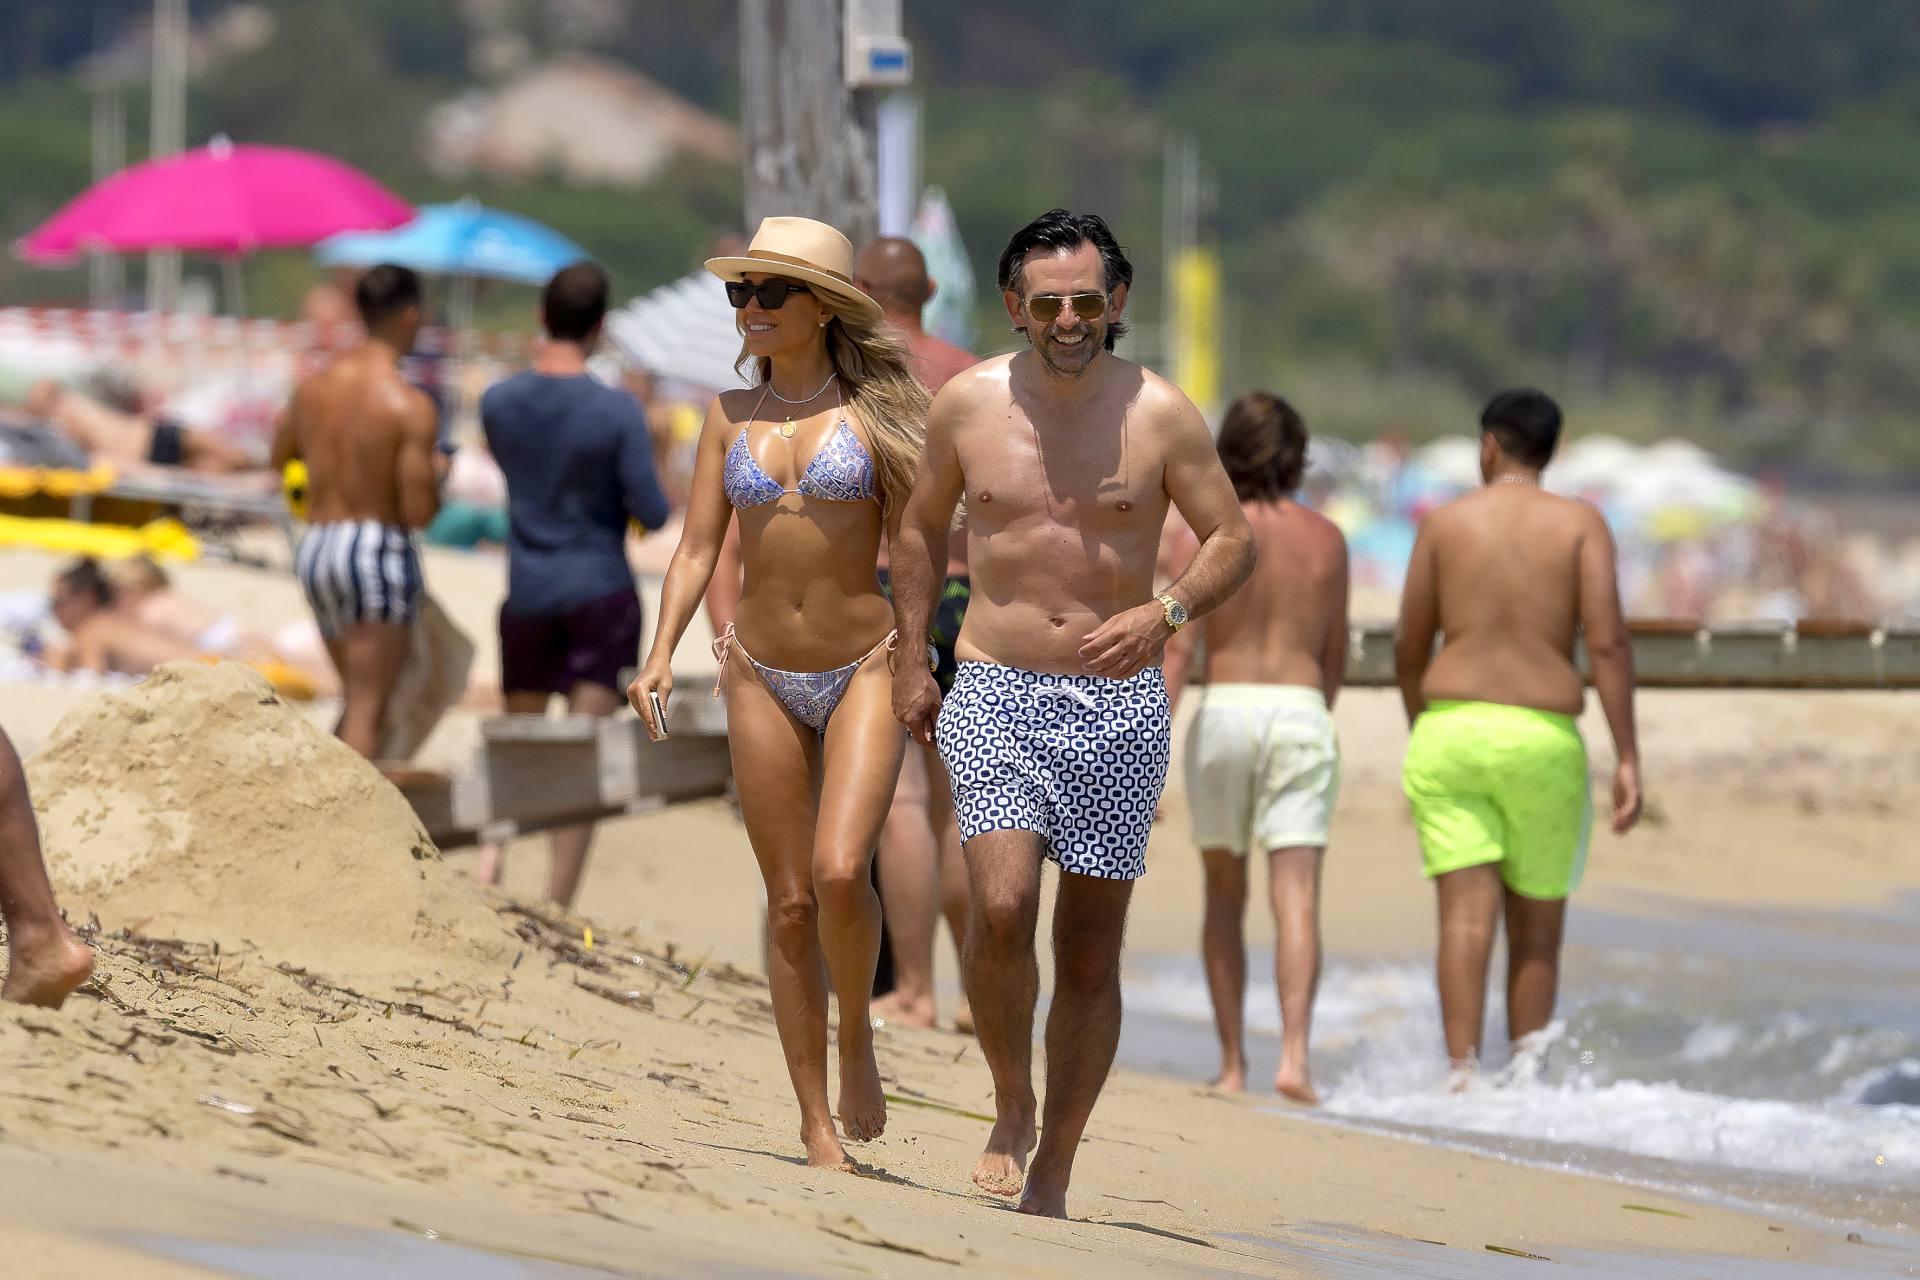 Sylvie Meis – Hot Toned Body In Sexy Bikini On The Beach In Saint Tropez 0004